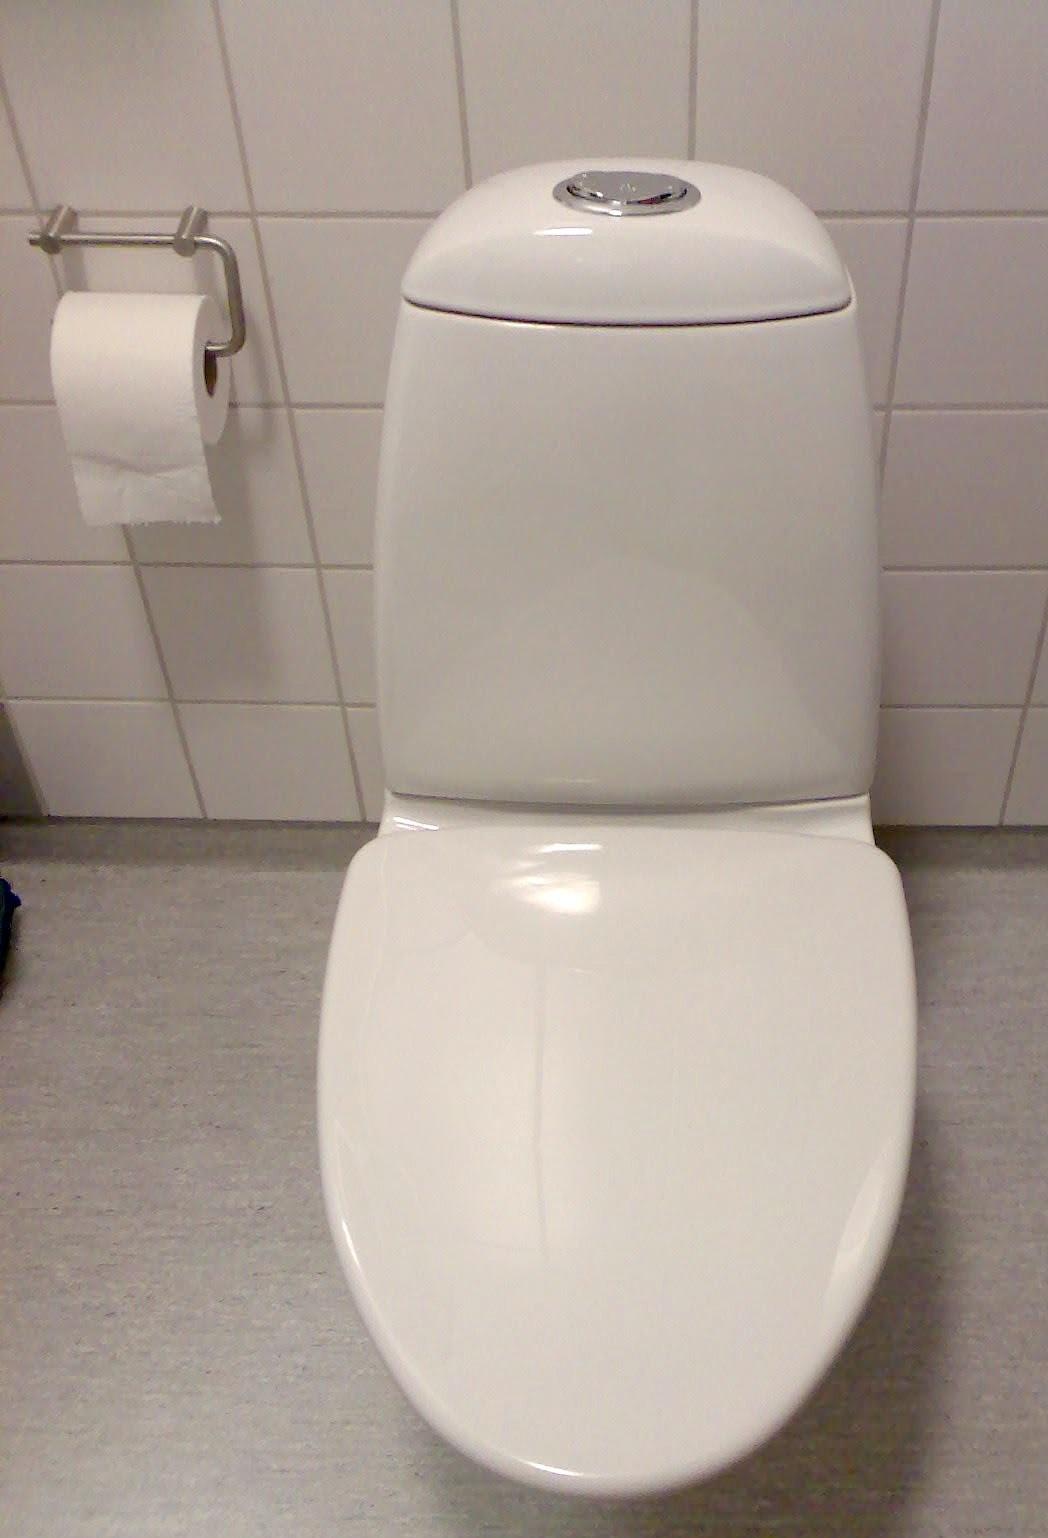 Sanibroyeur Installatie Erkende Loodgieter | Loodgieters.nl serapportantà Toilettes Sanibroyeur